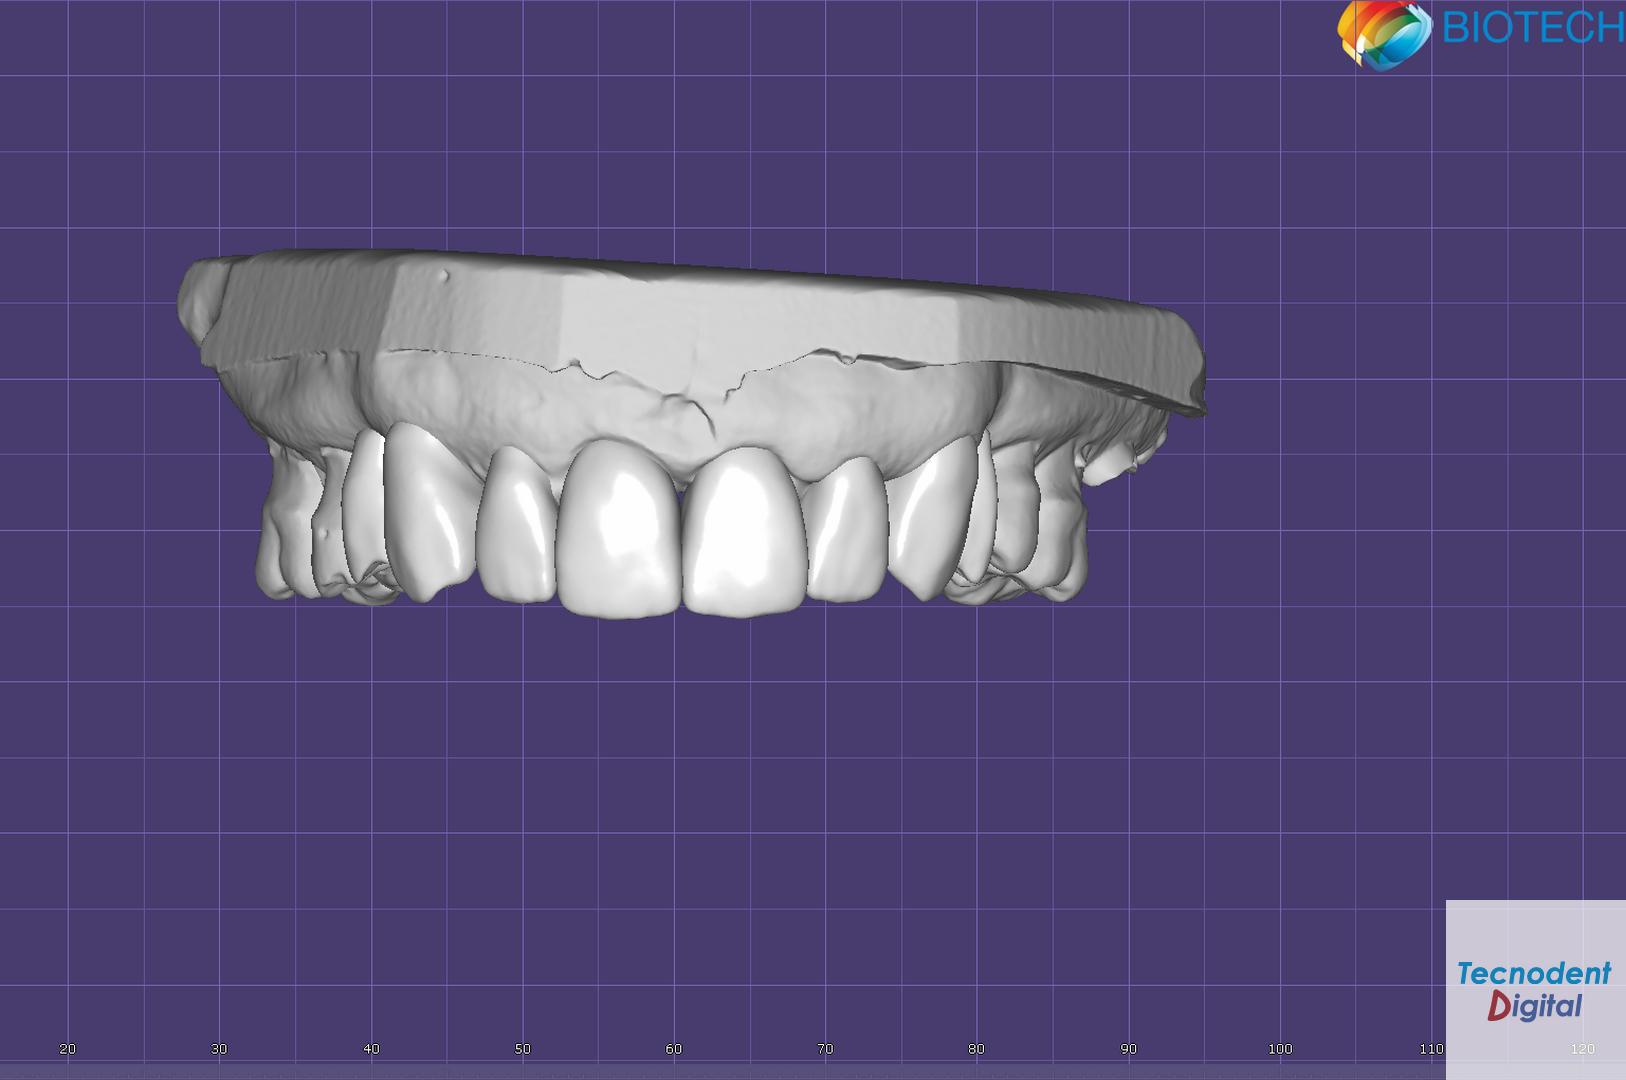 Estudio Estético Exocad Diseño Dental 3D Modelos Mock Up